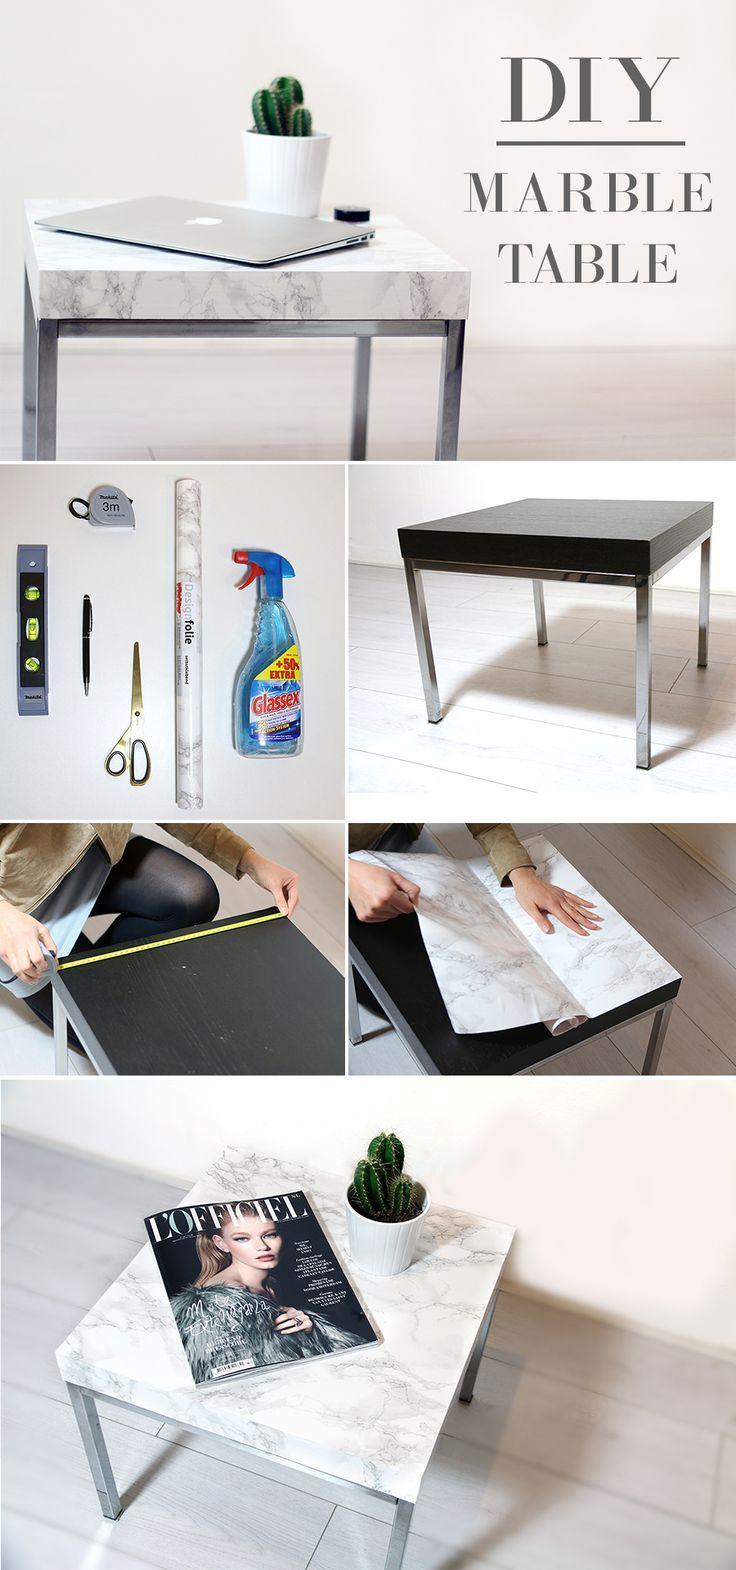 Diy Marble Table Diy Furniture Ideas In 2019 Diy Room